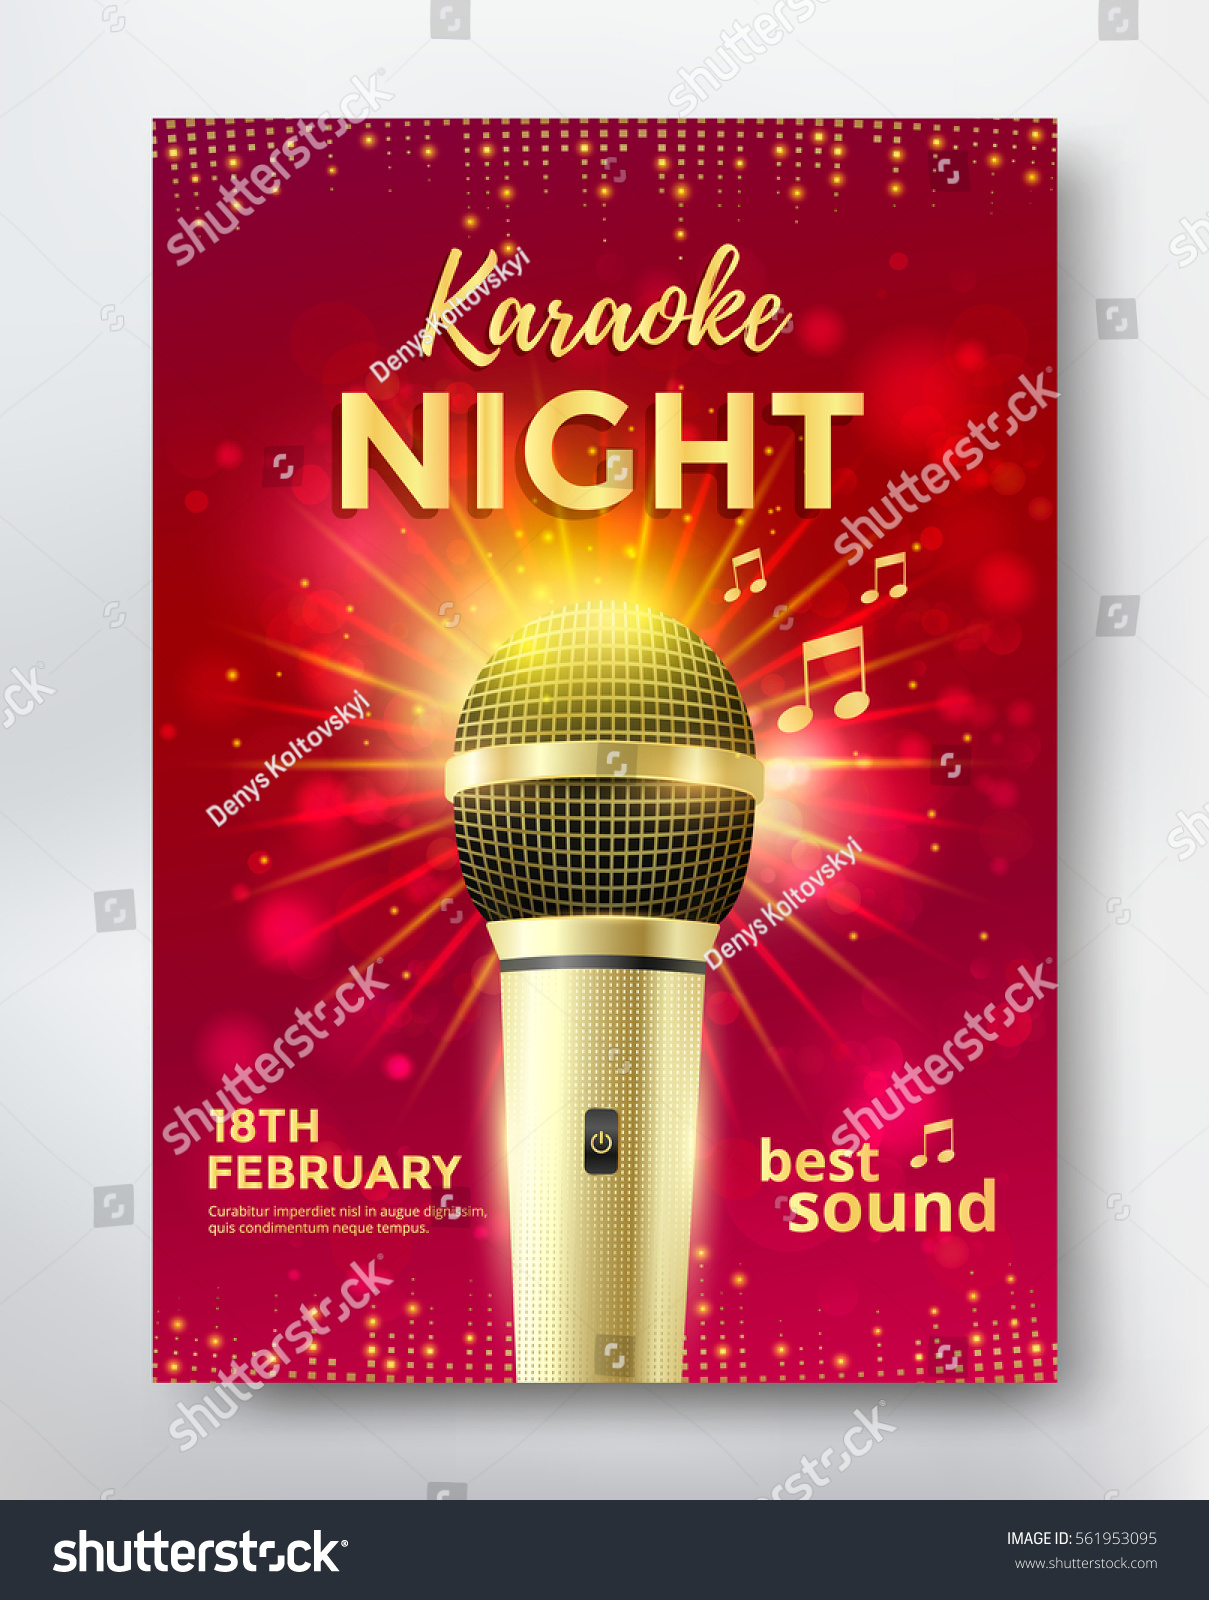 karaoke night poster template design golden のベクター画像素材